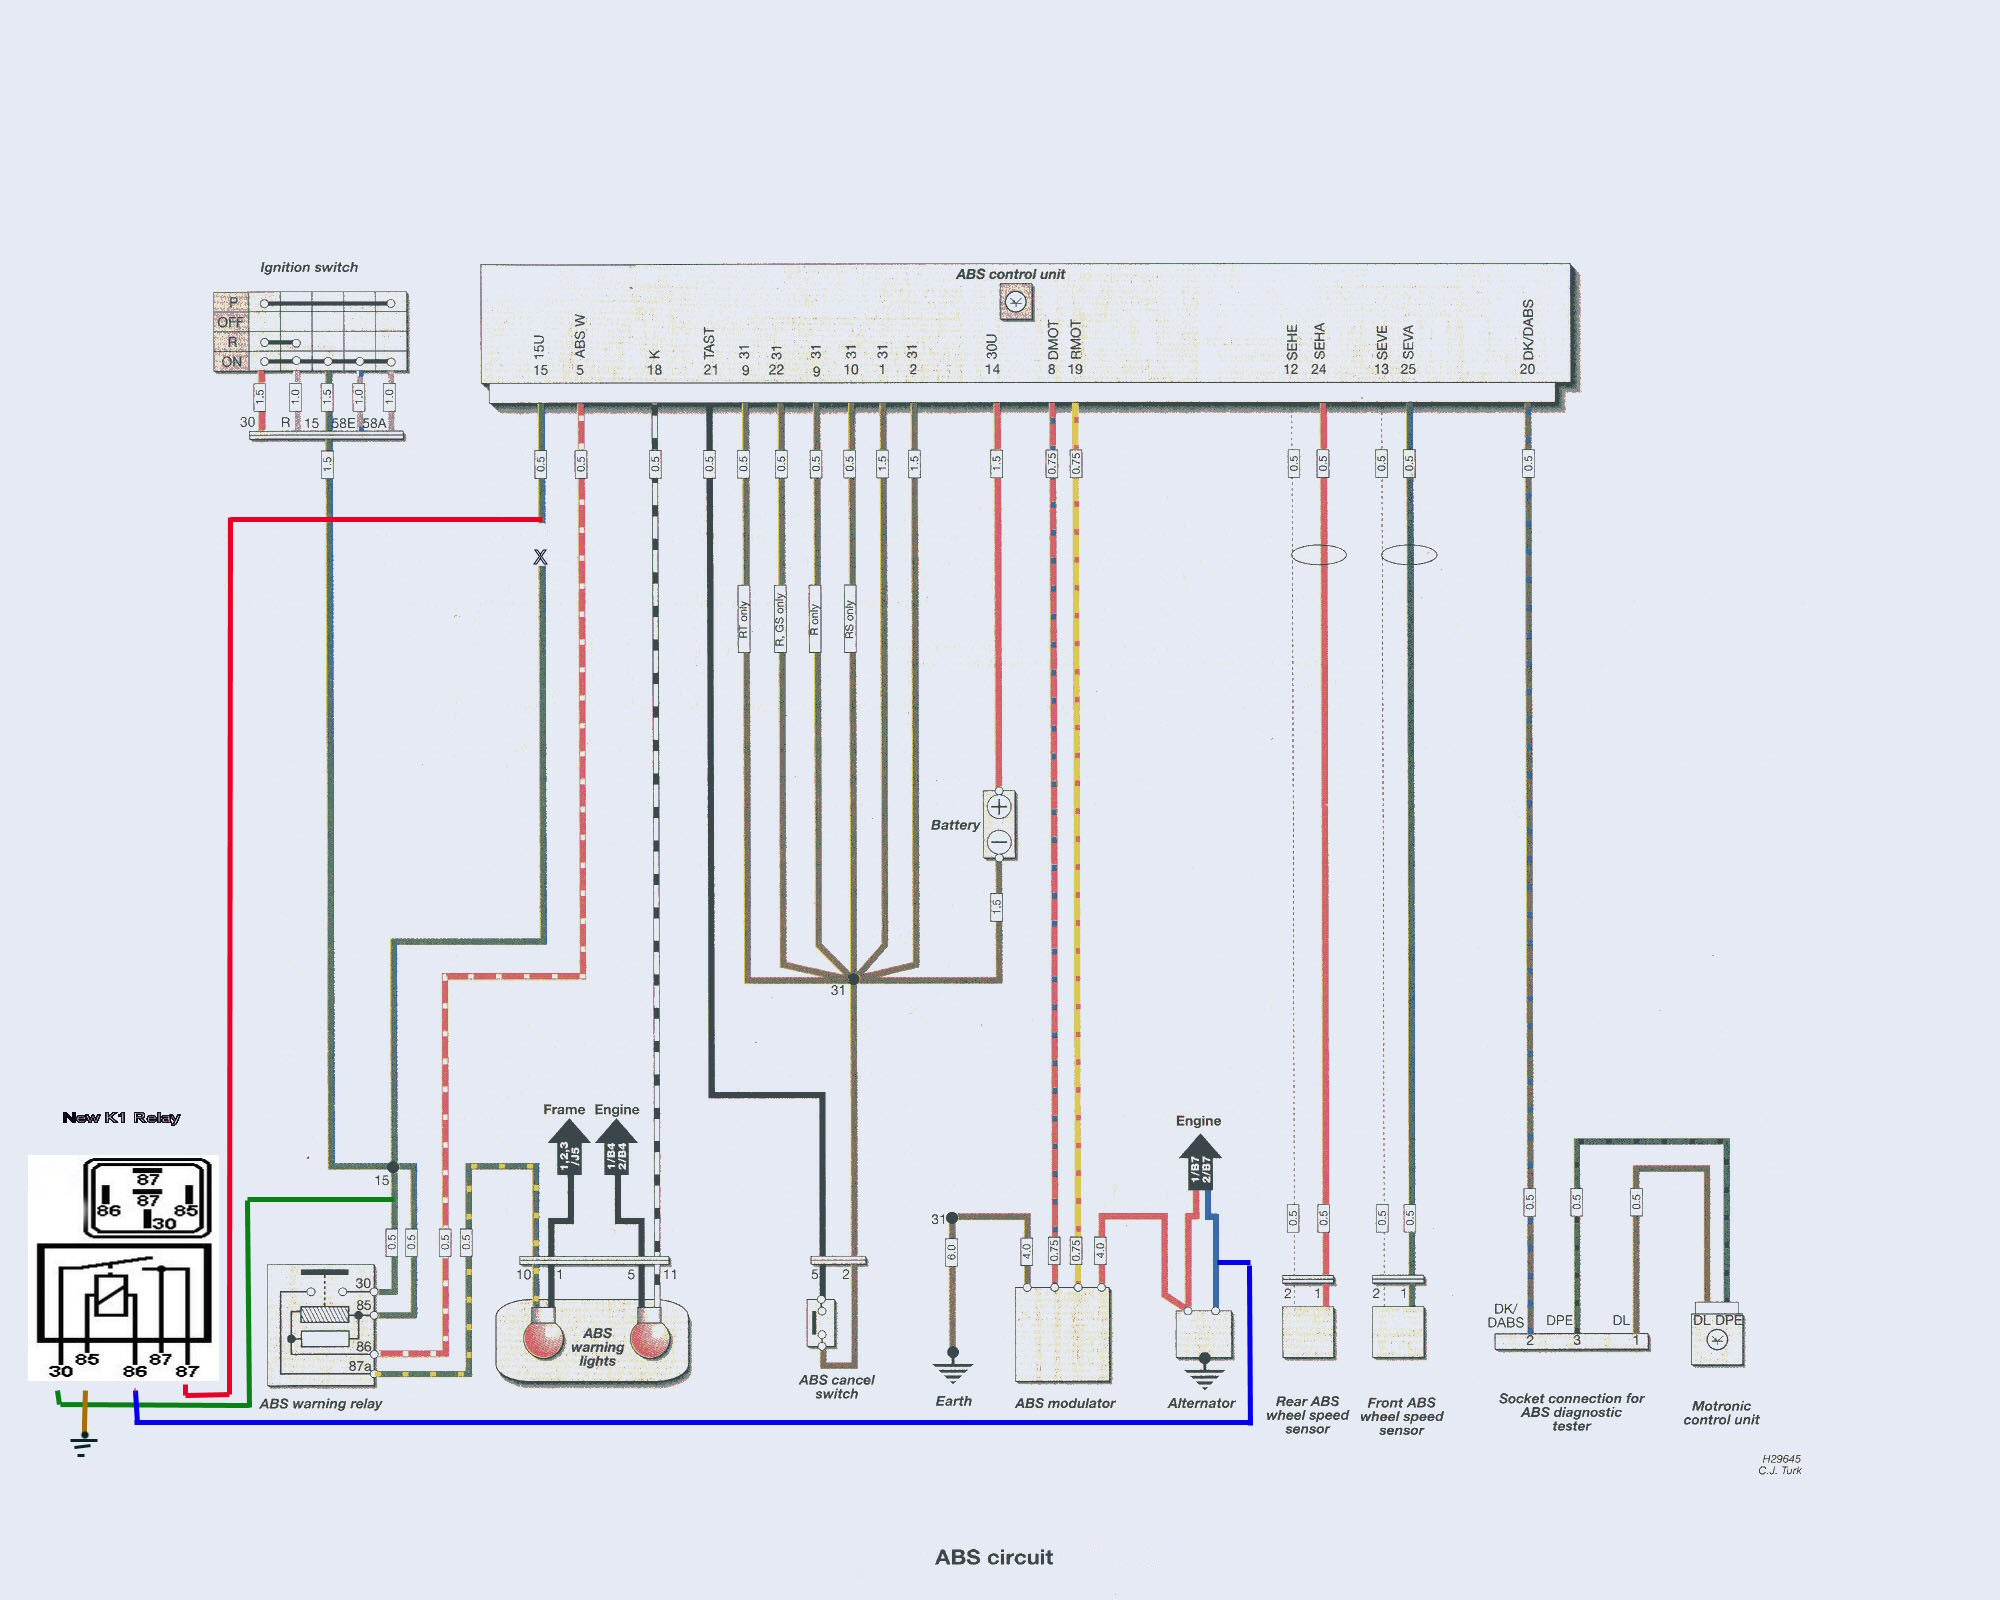 e36 diagnostic port wiring diagram msd 2 step abs ii low voltage fault modification the internet bmw